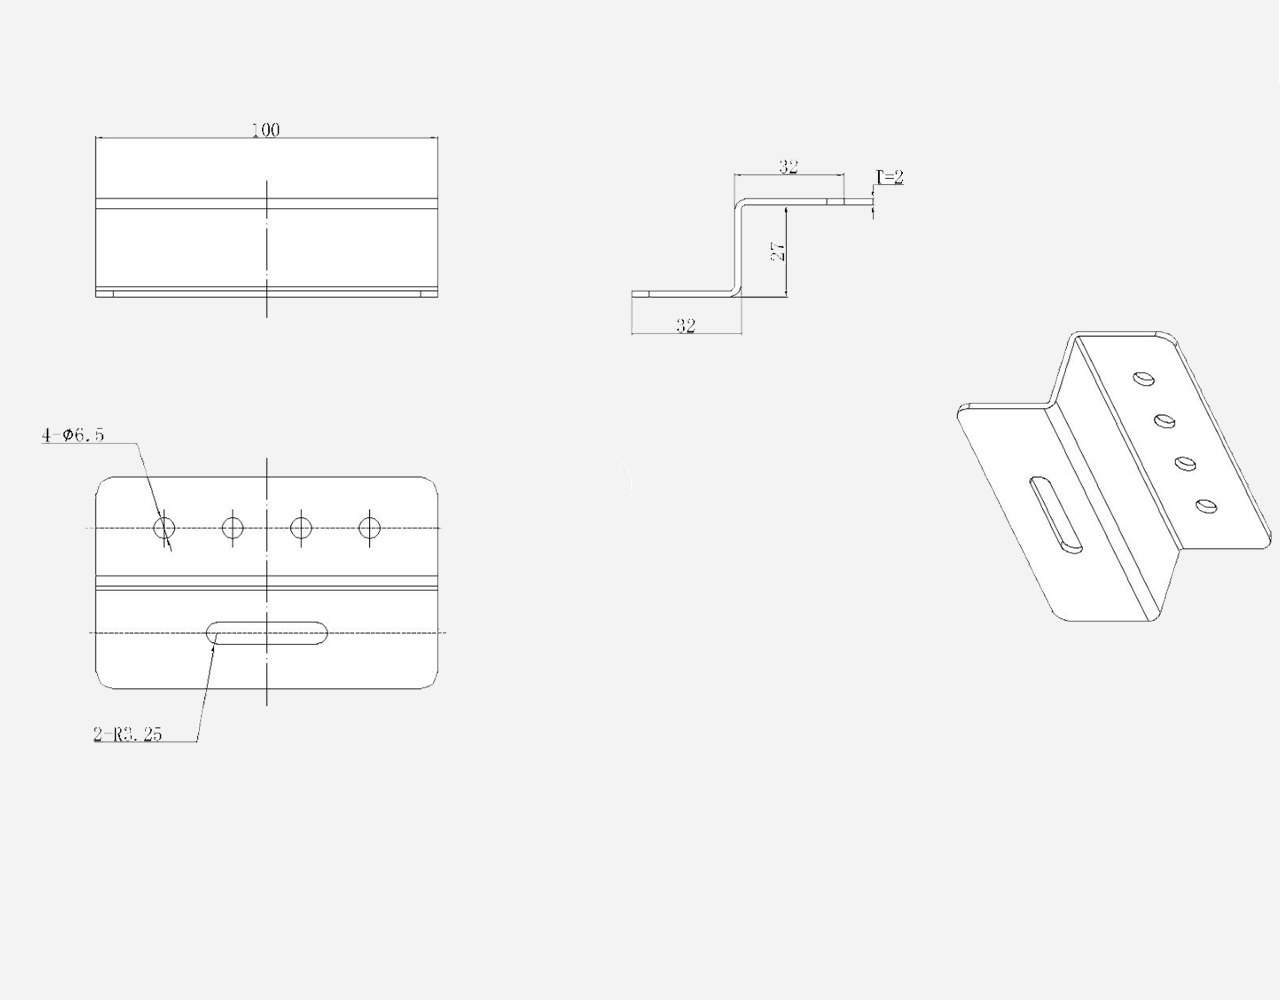 EnjoySolar® Aluminium Montage Set Z-beugels b.100mm h.30mm